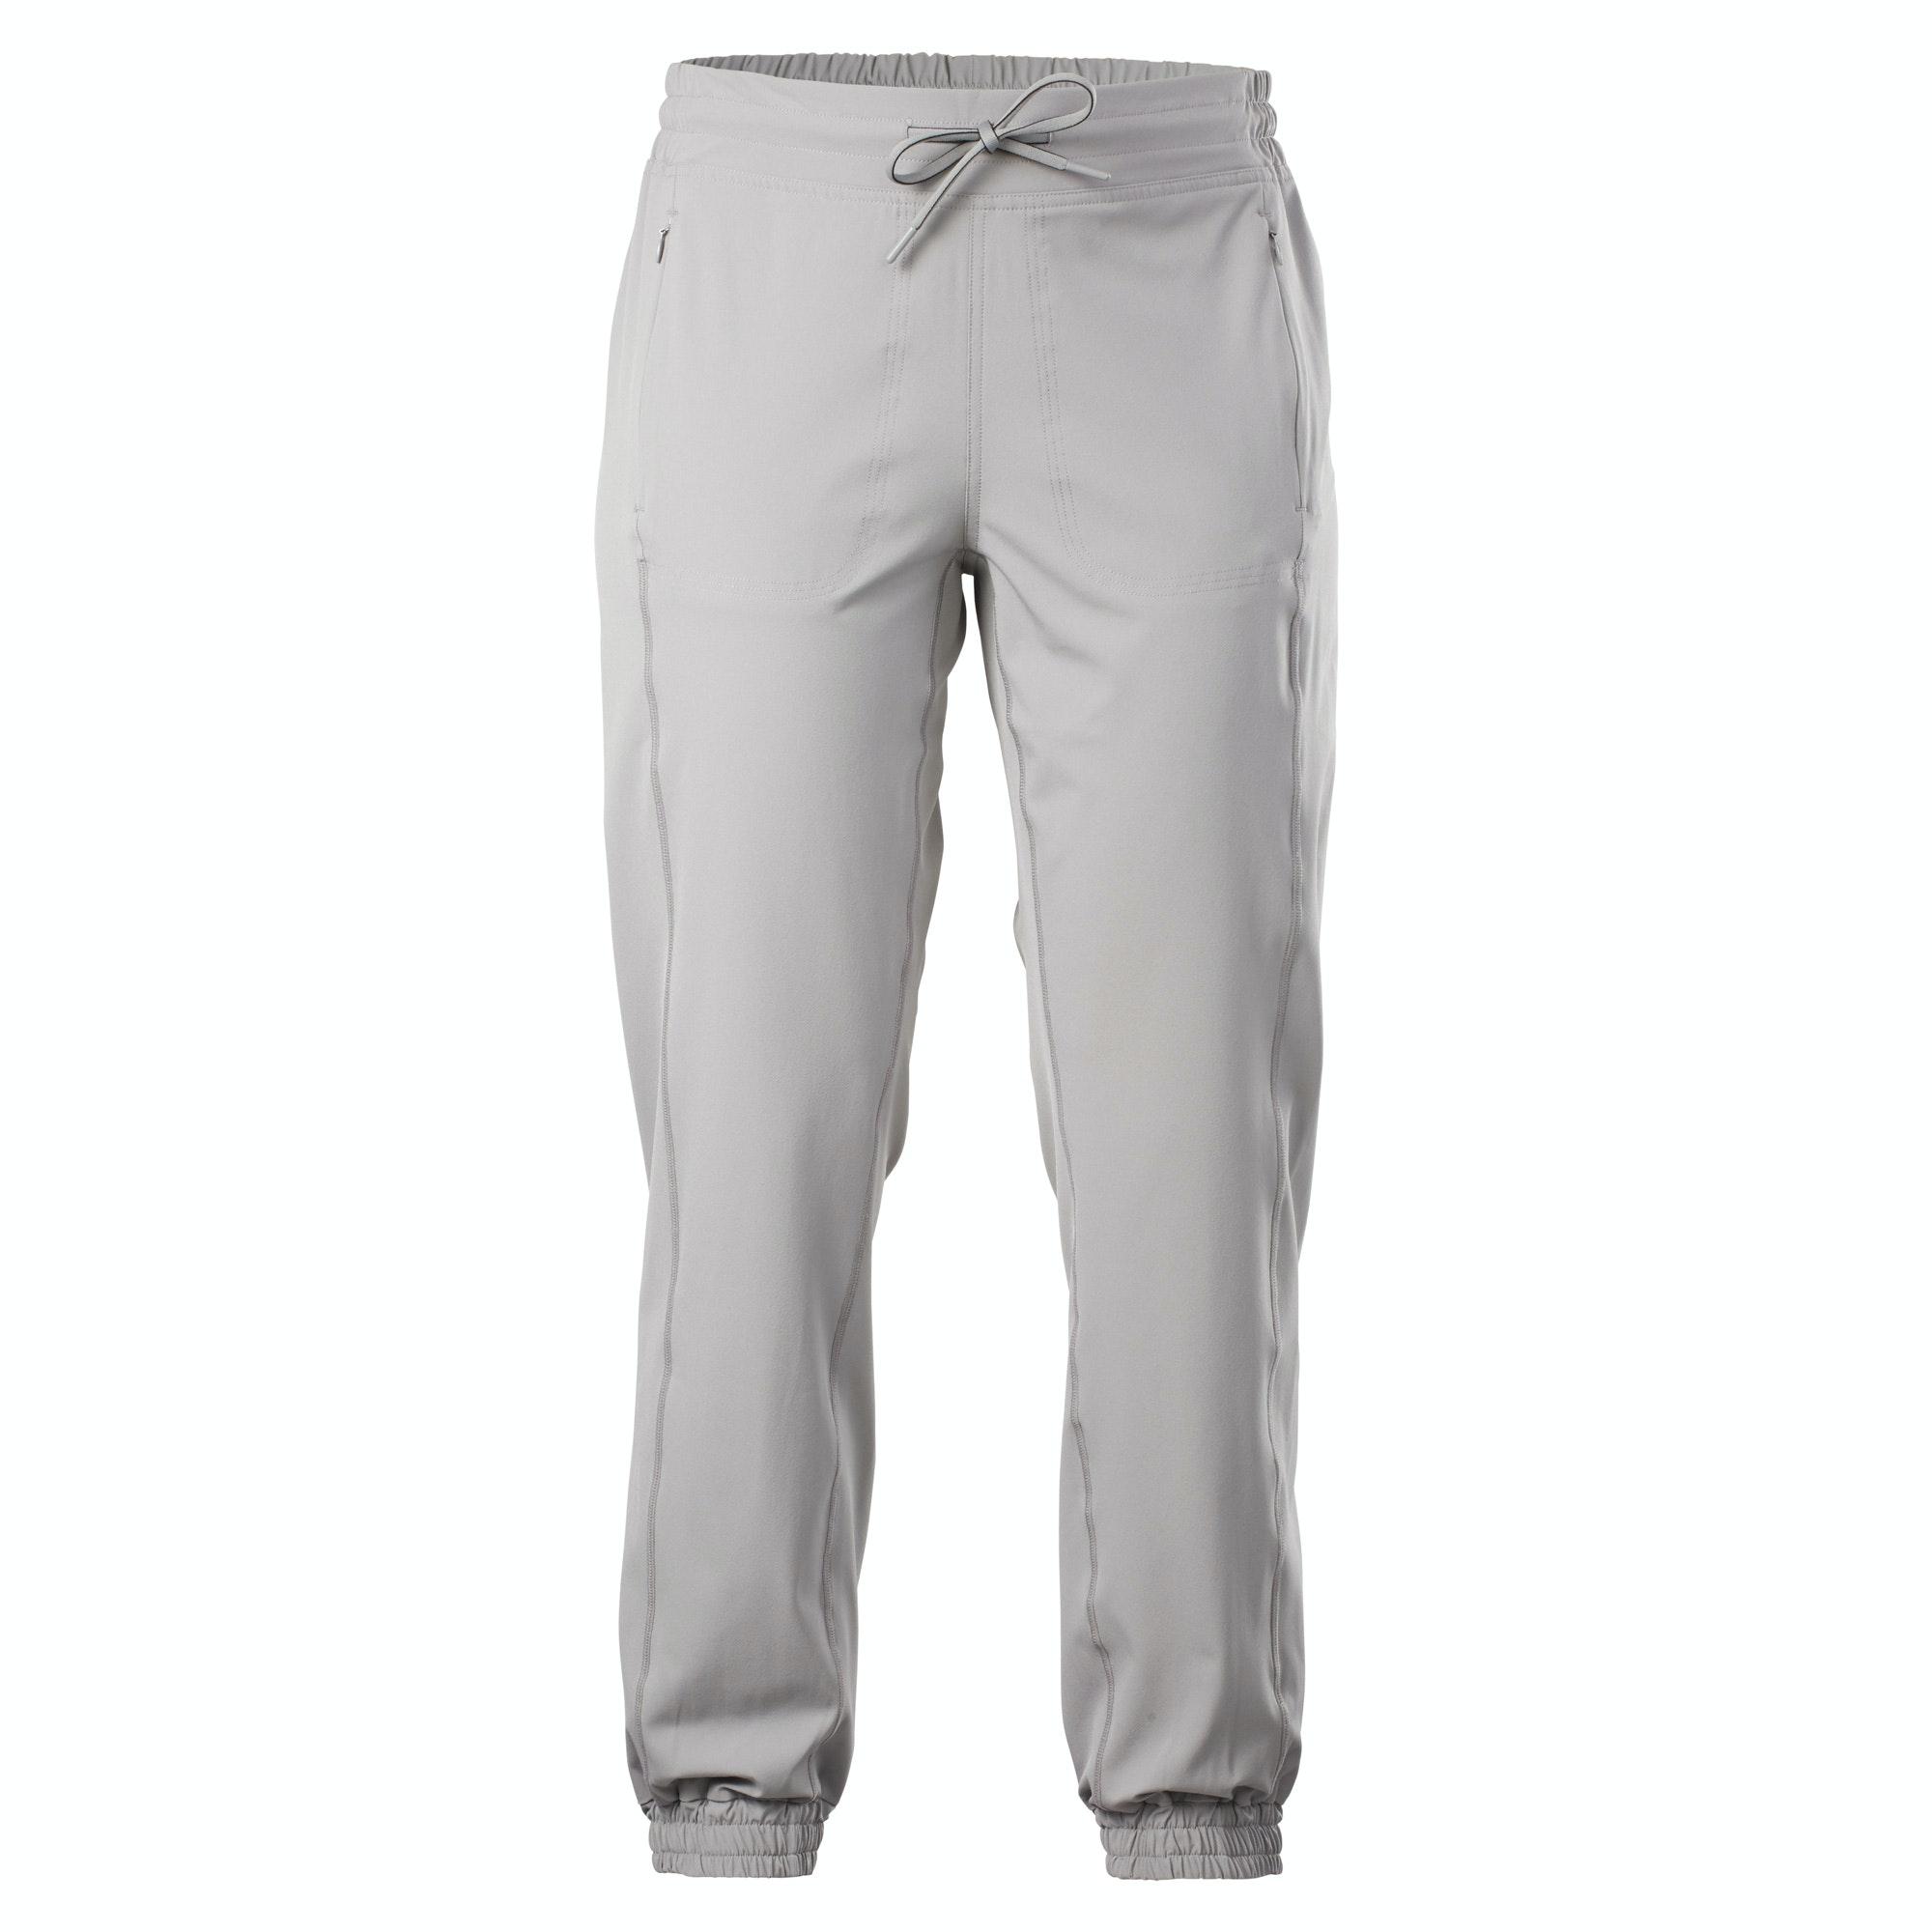 golden orange skinny front comfortable zipper vibrant fresh products comforter asymmetrical pants lana